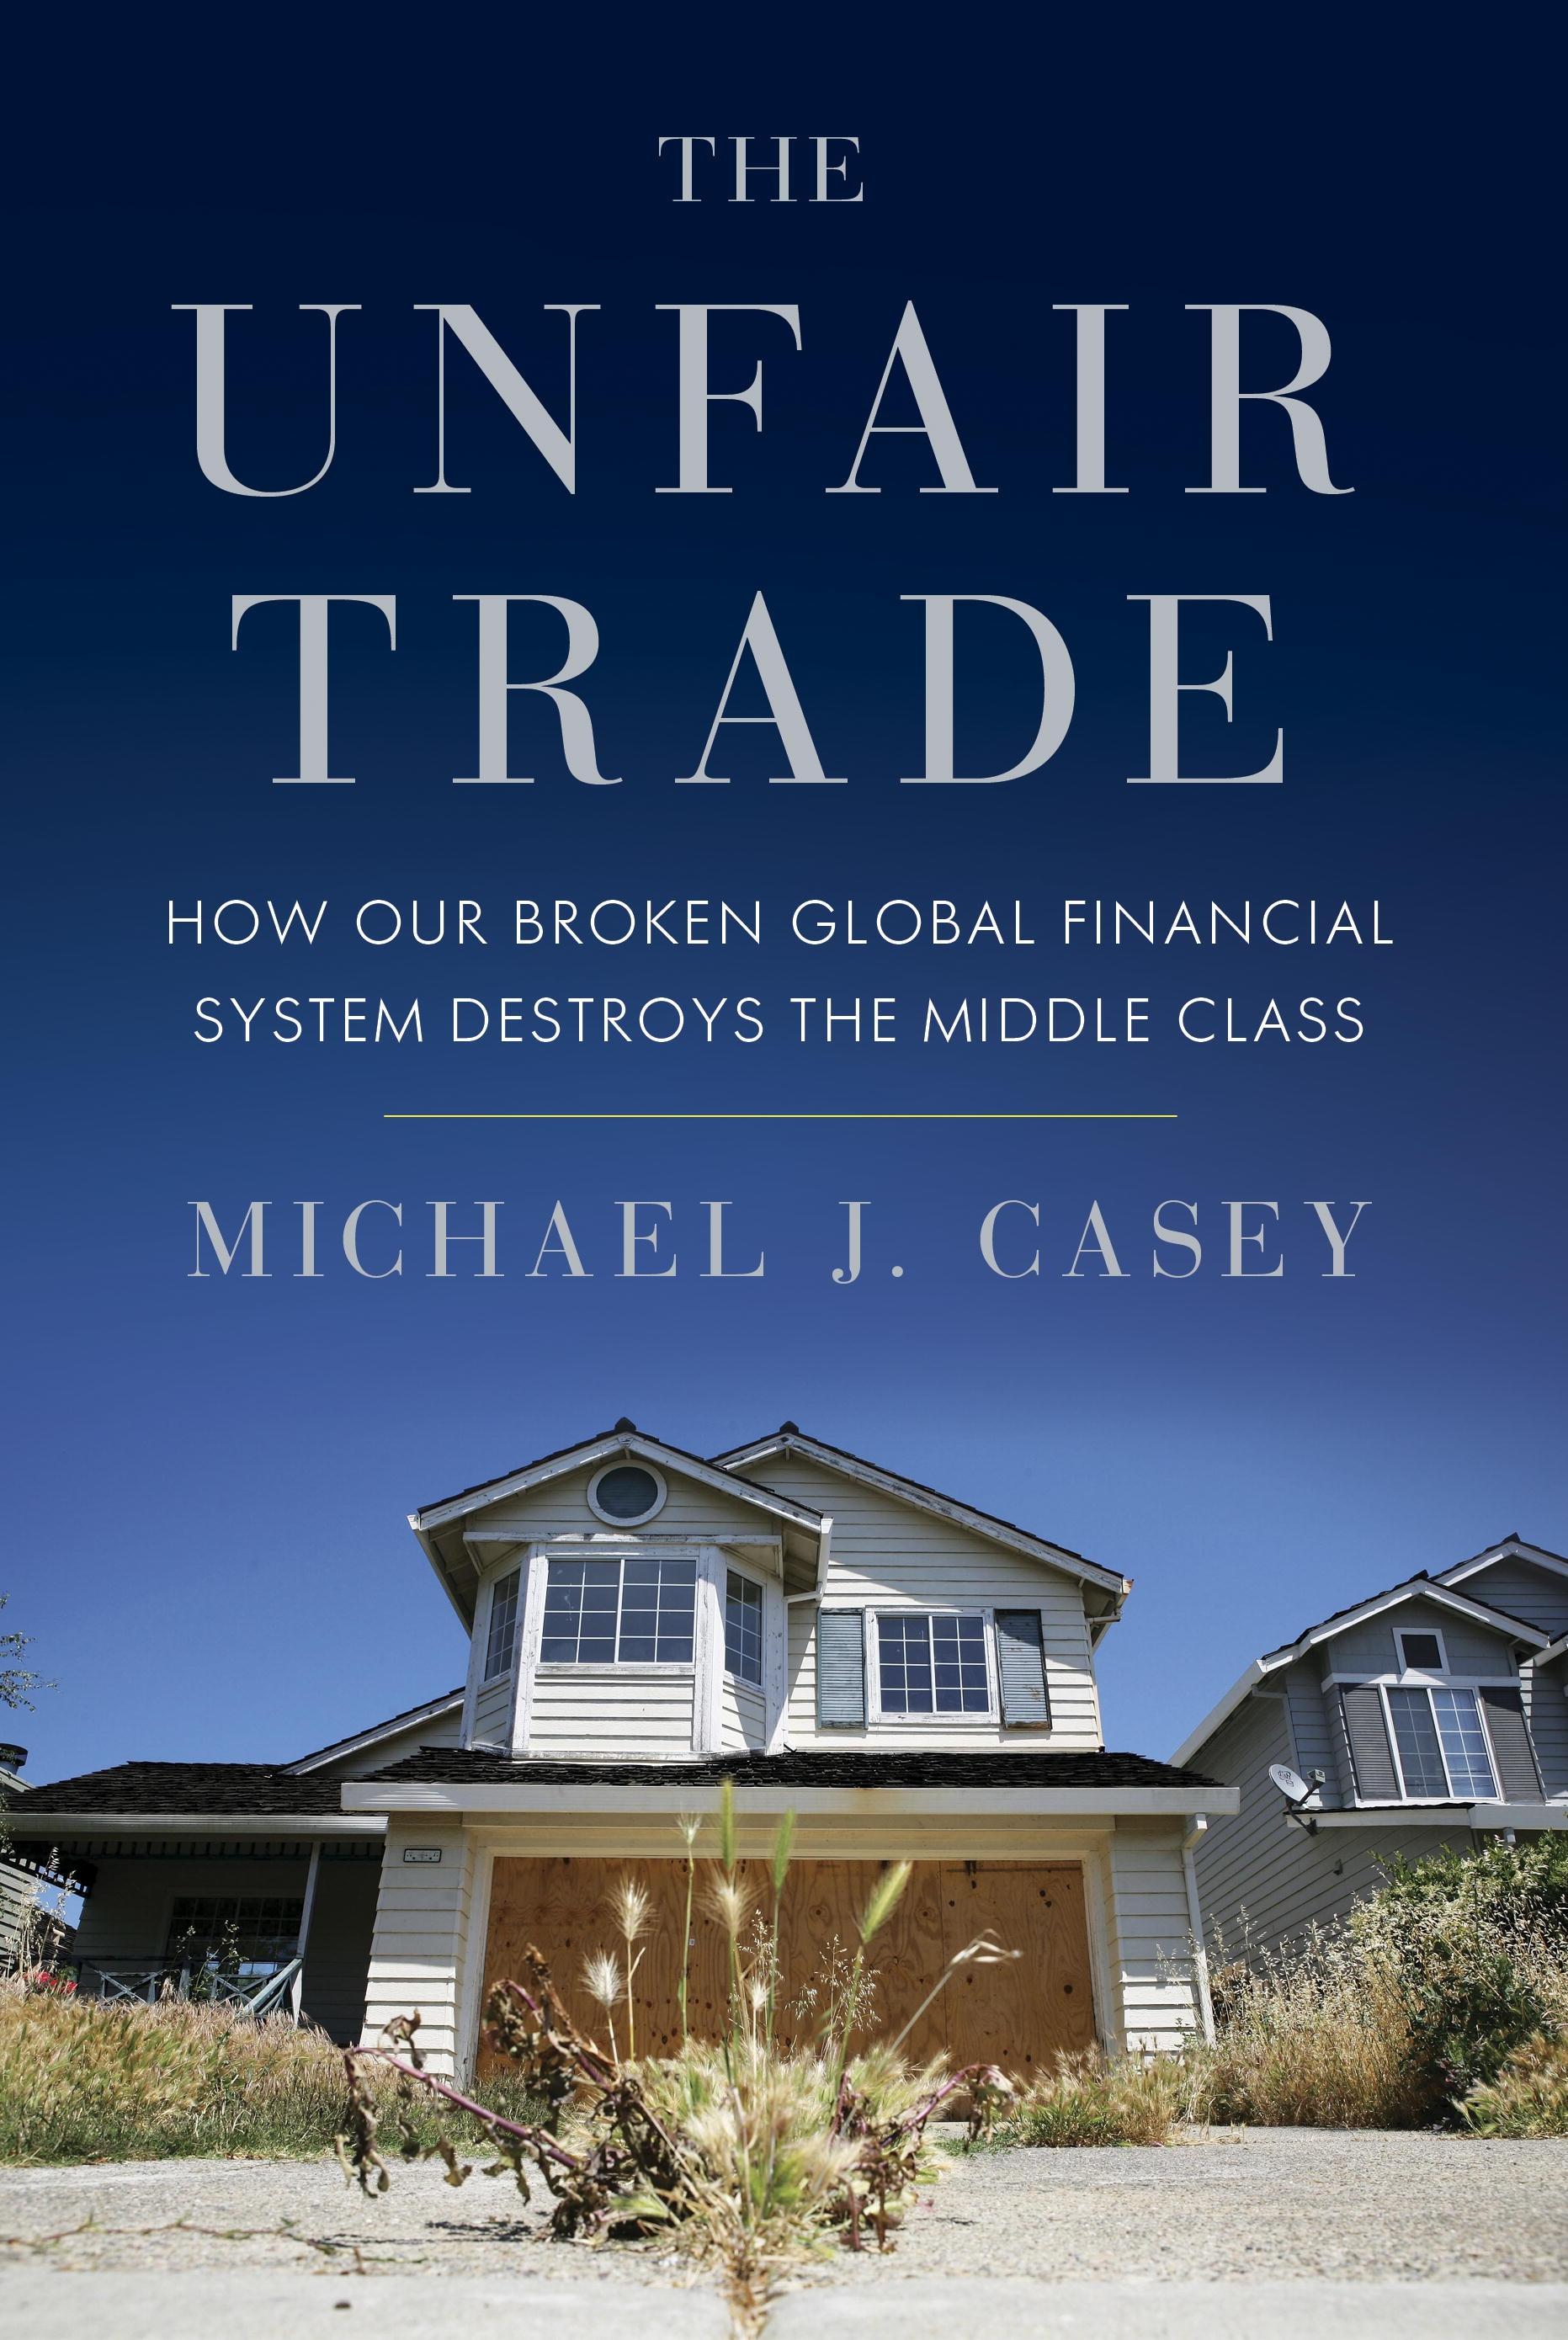 Cover Image-Unfair Trade (1).JPG